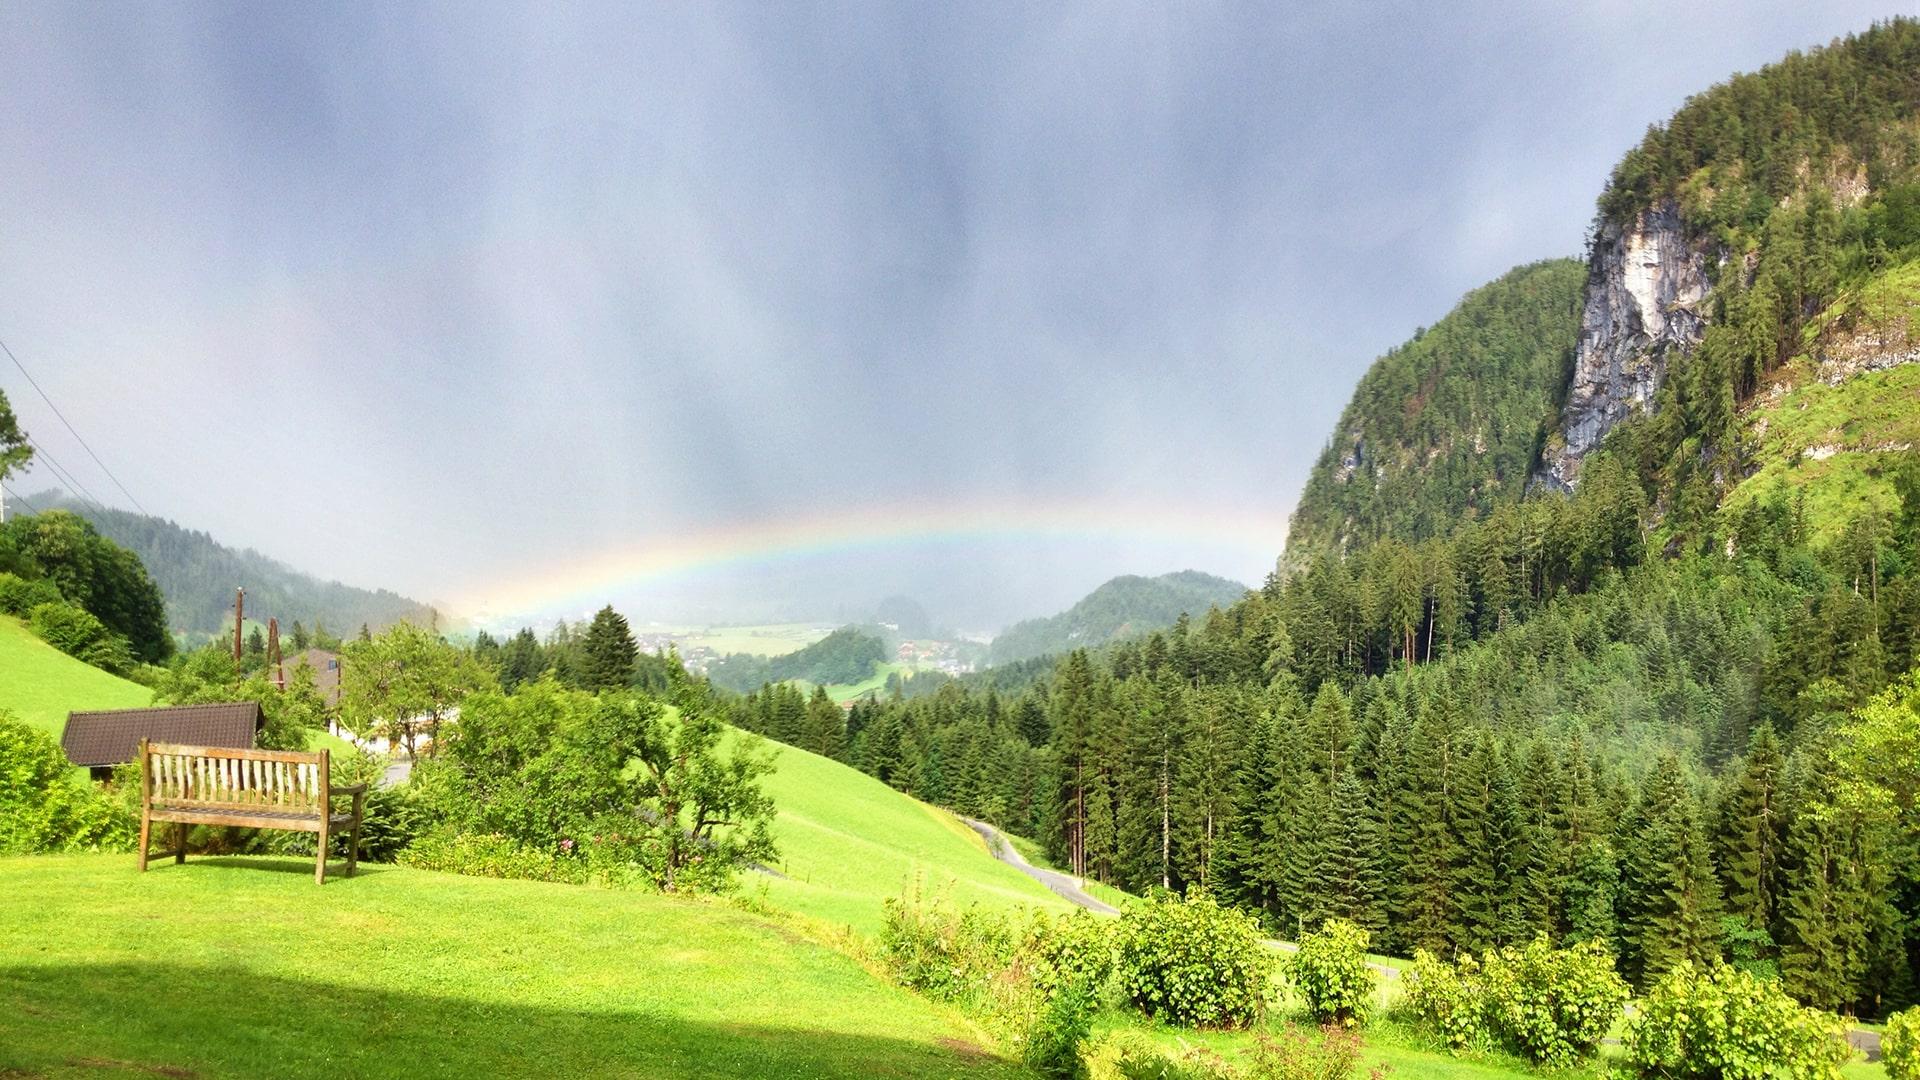 Blick ins Tal mit Regenbogen-min